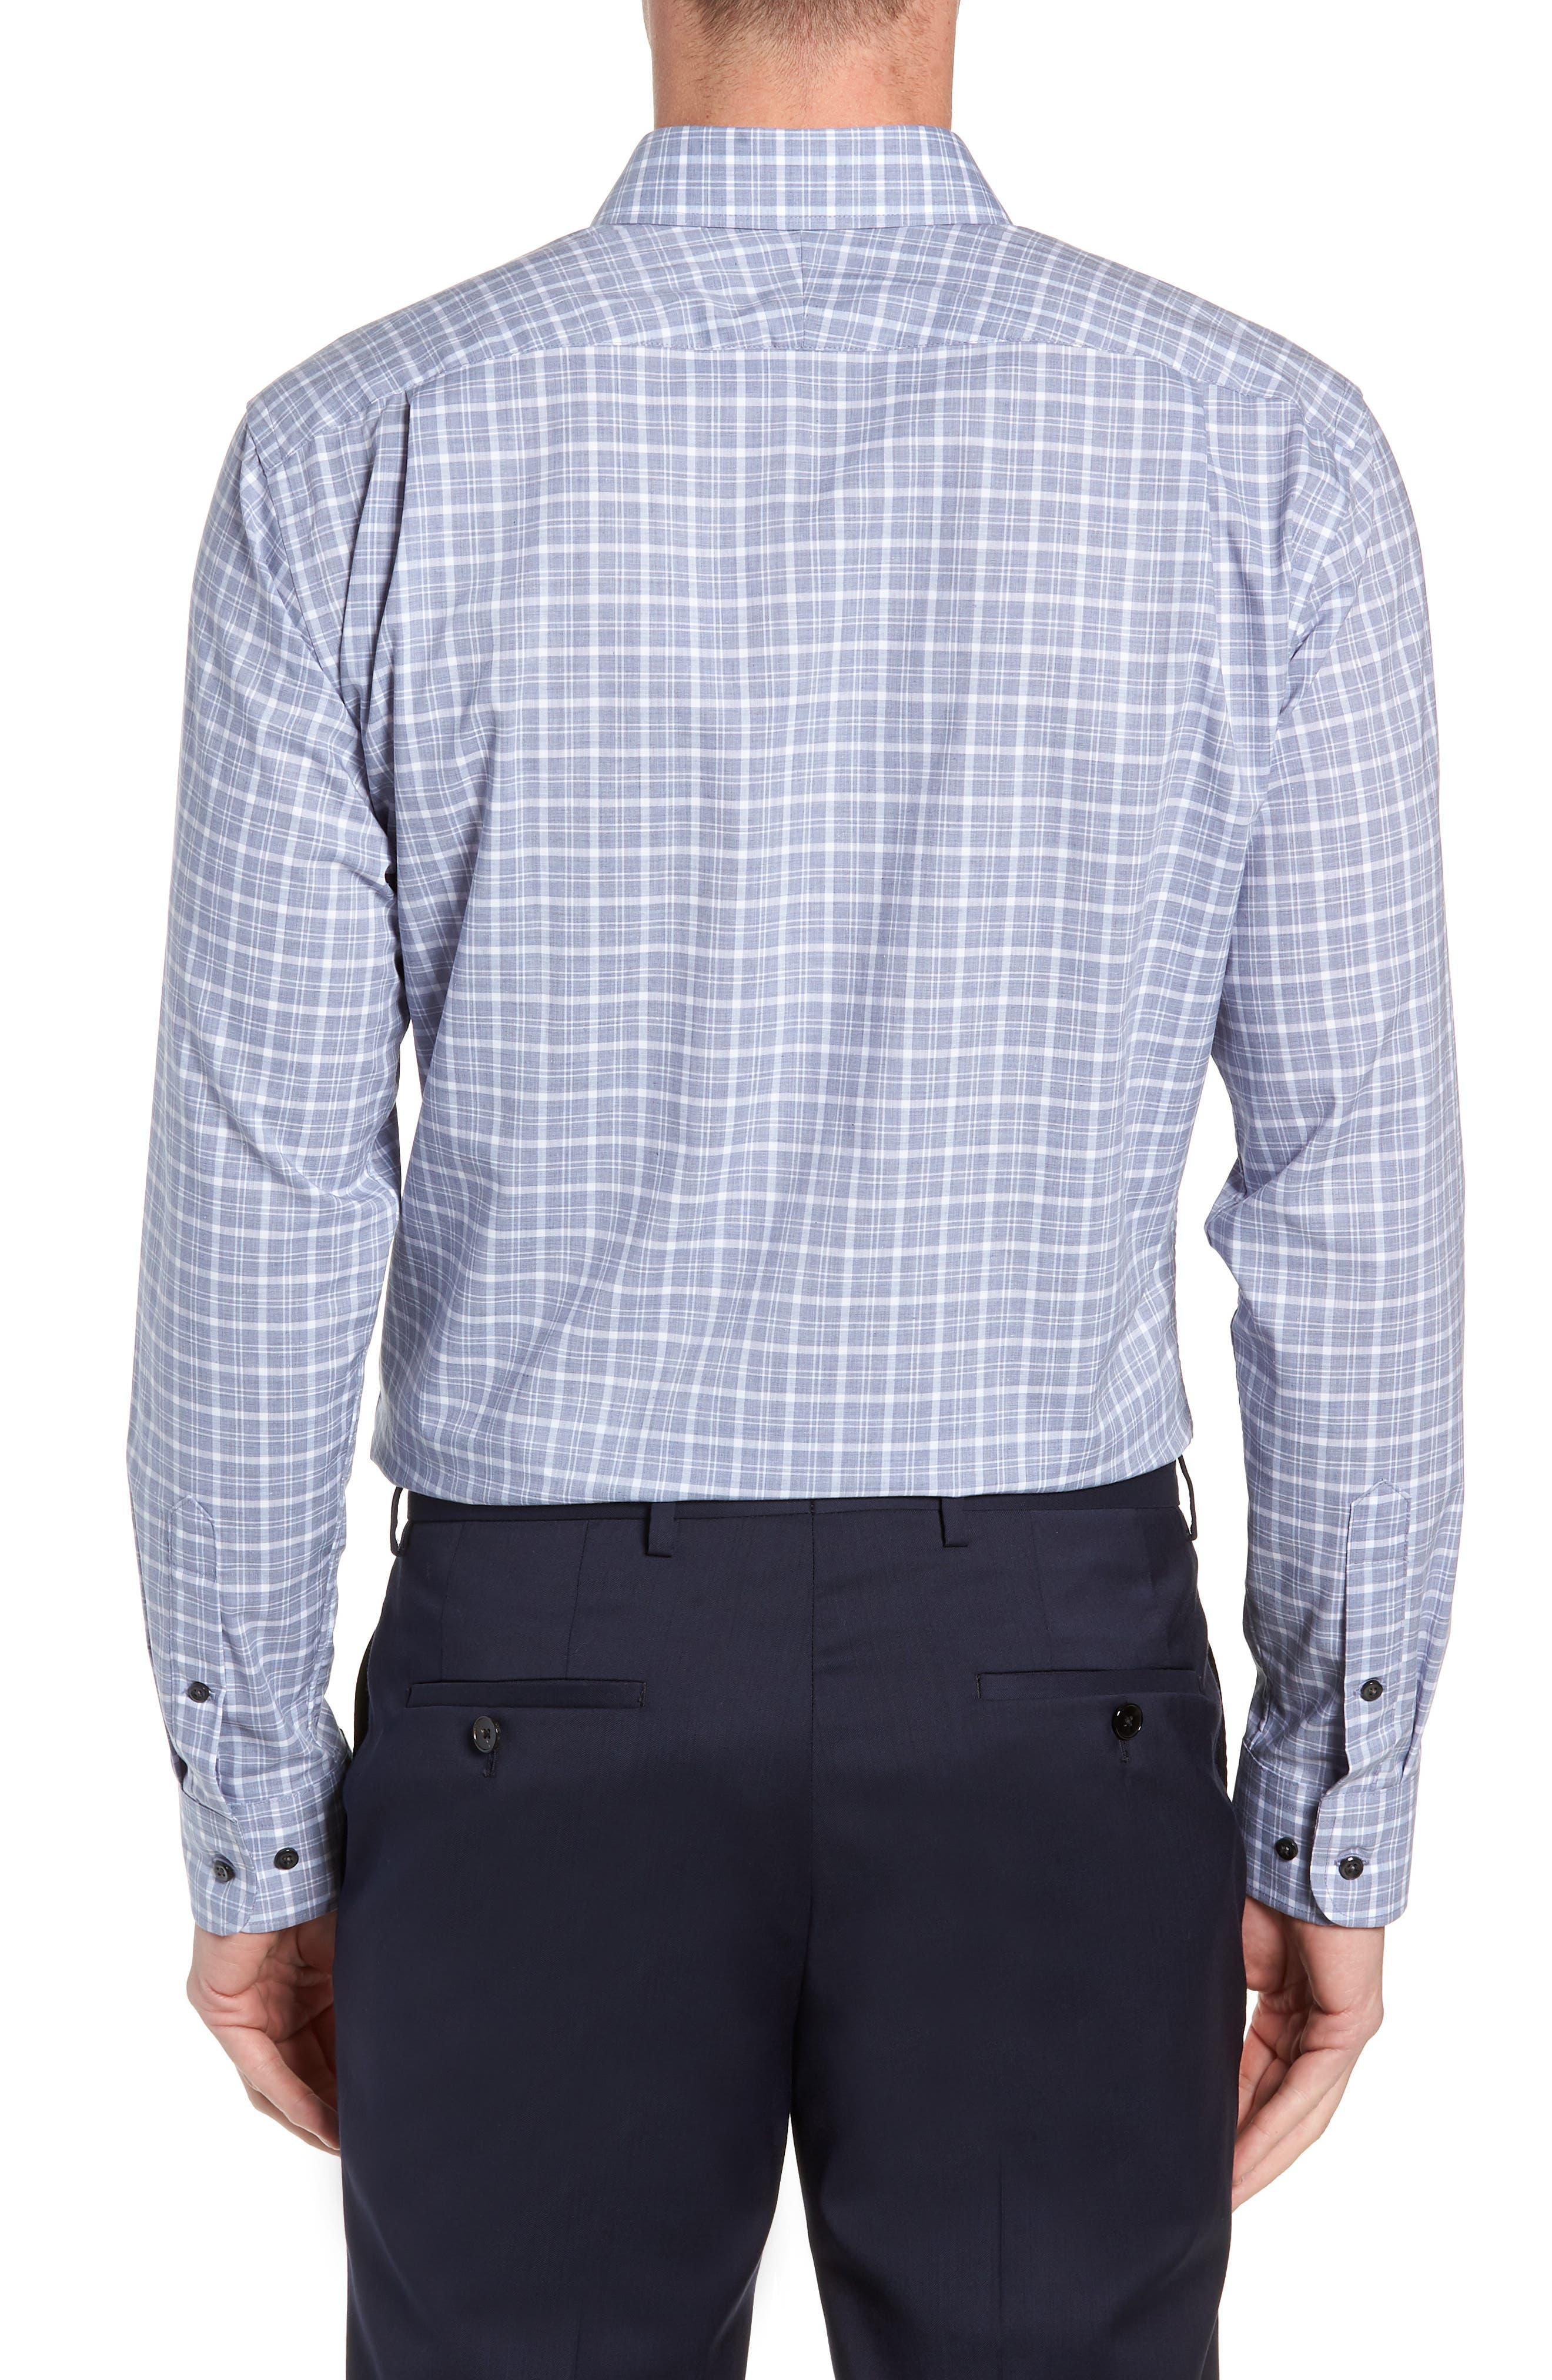 Trim Fit Non-Iron Plaid Dress Shirt,                             Alternate thumbnail 3, color,                             420